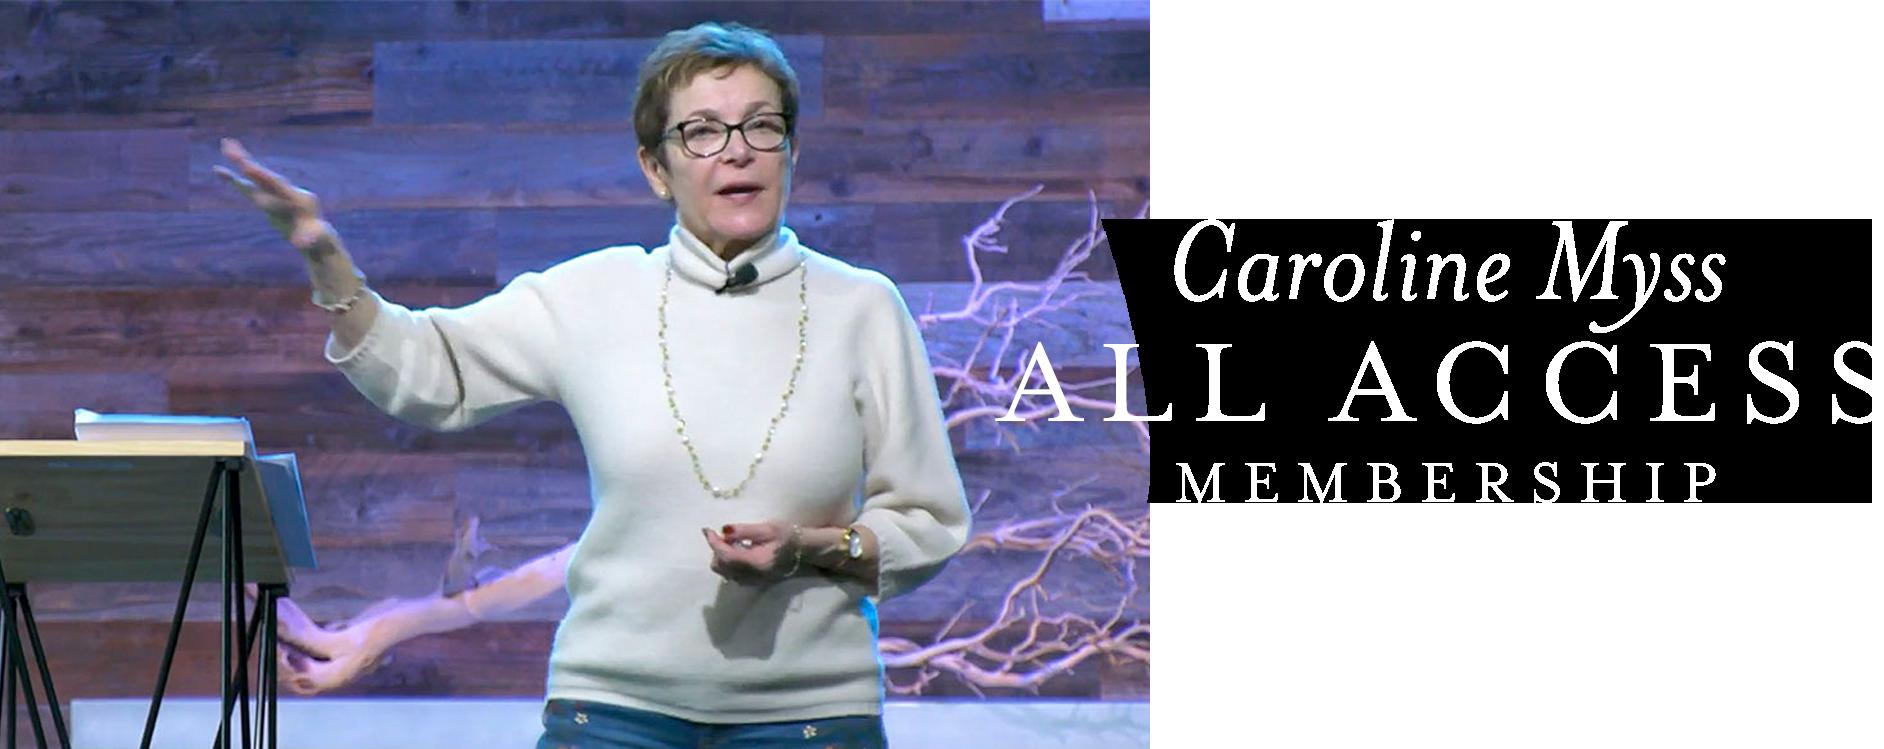 Caroline Myss All Access Membership